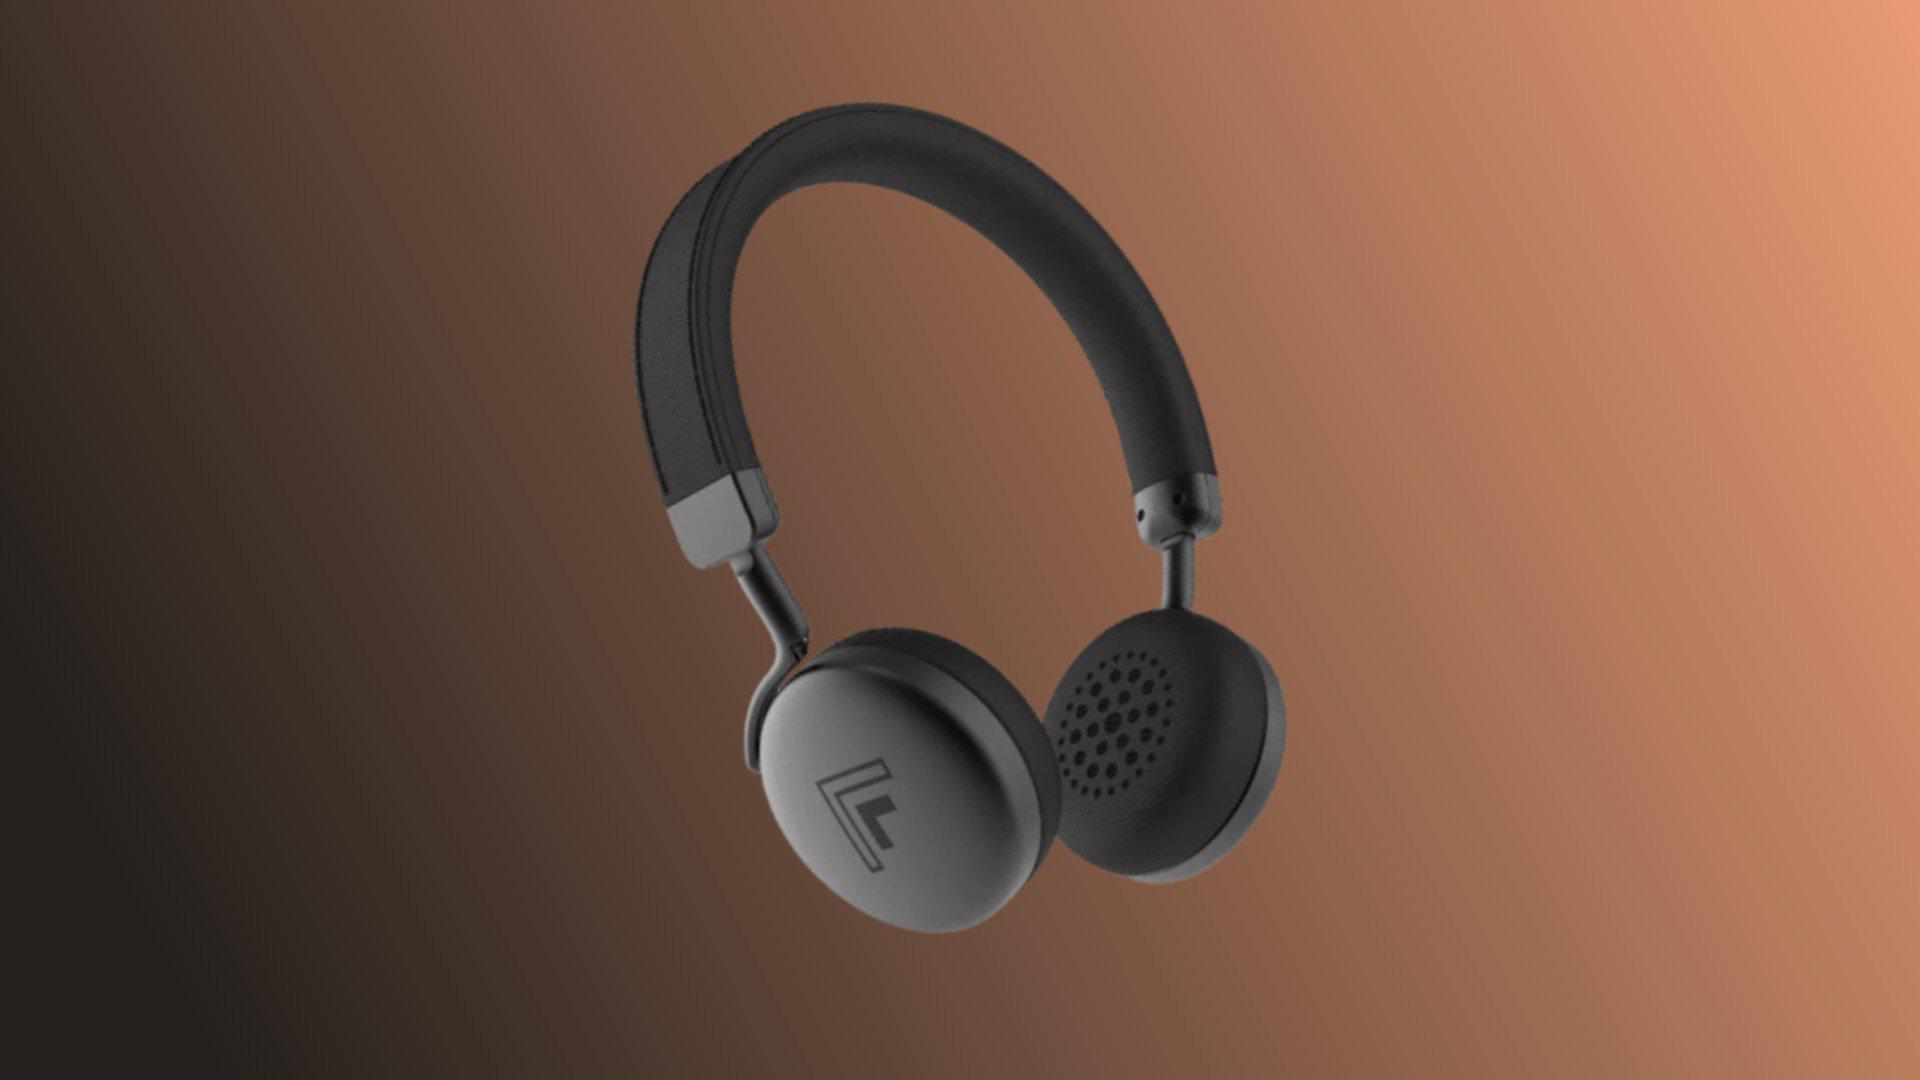 Headset bluetooth focus style 2